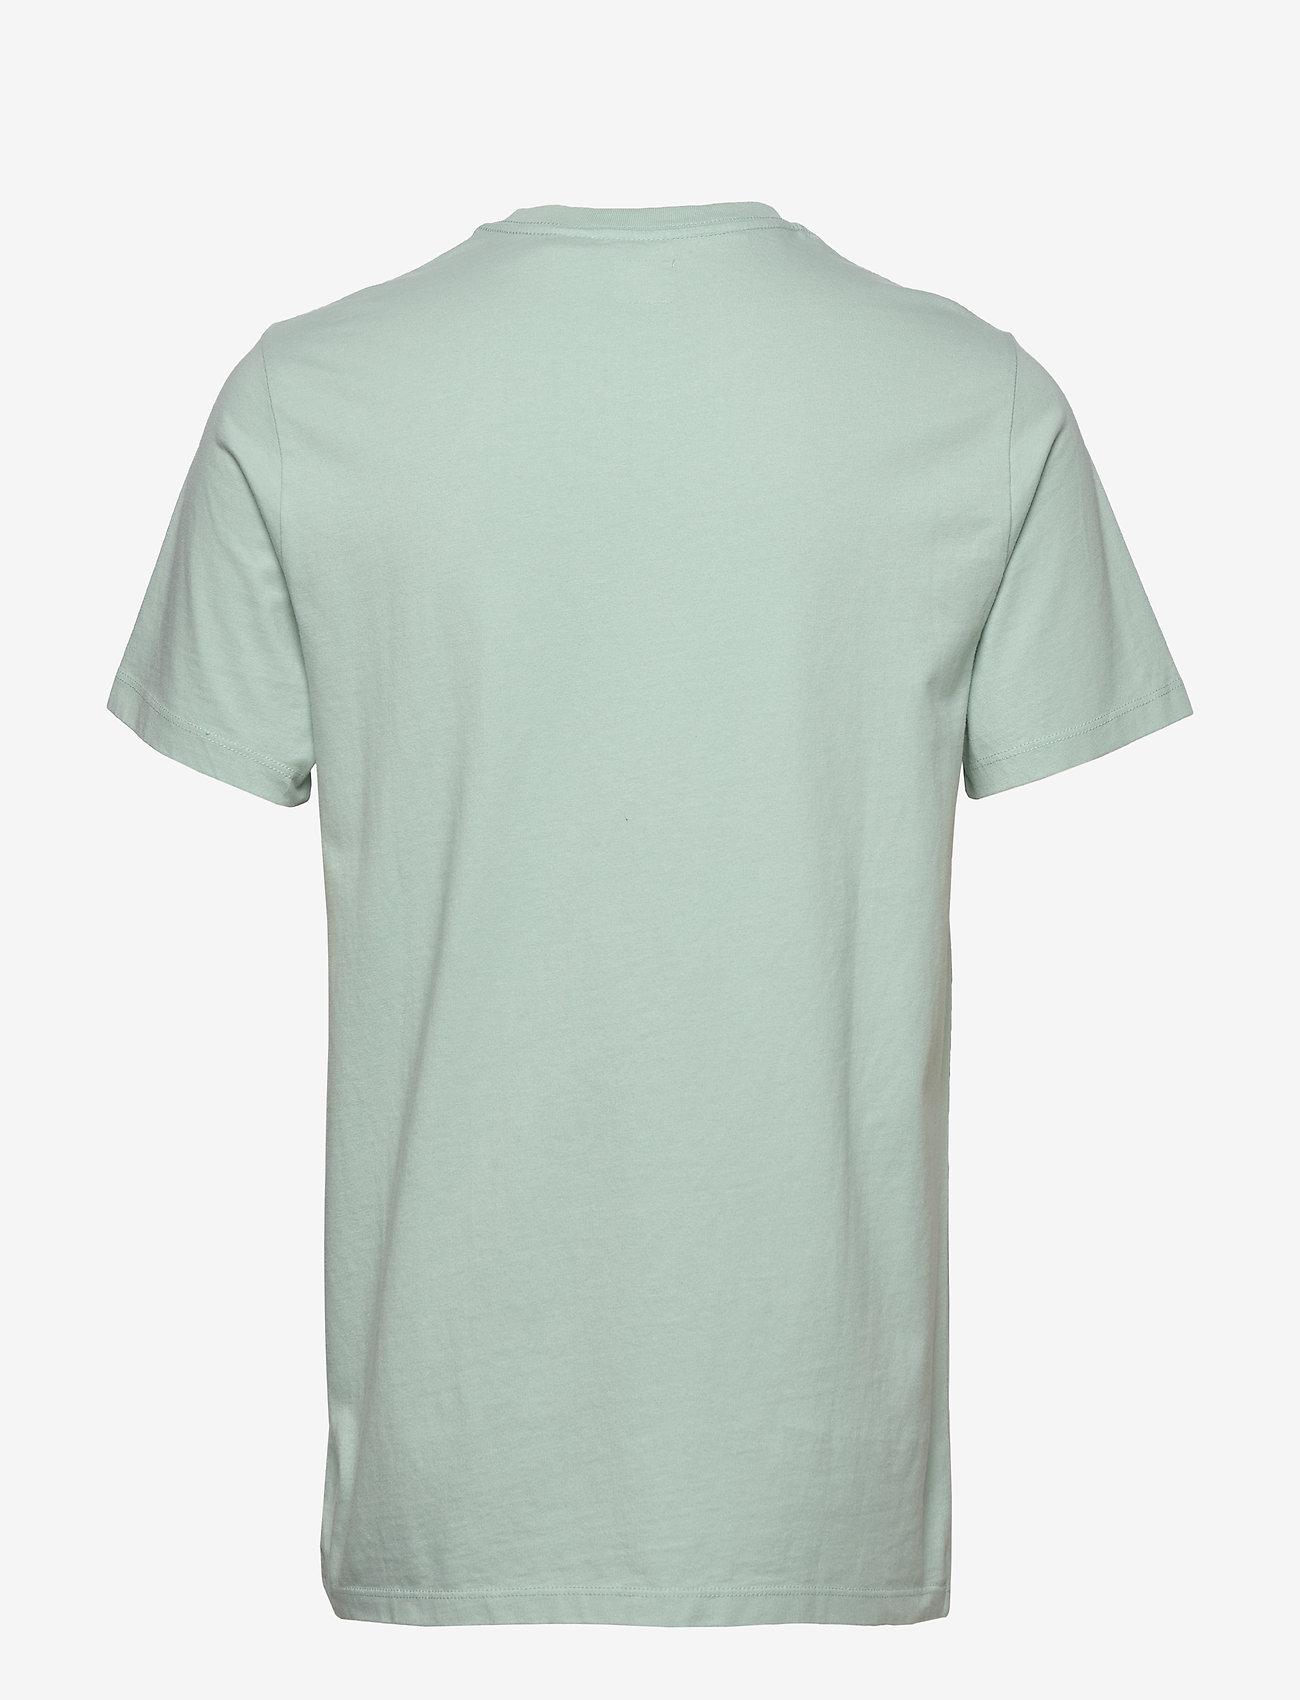 Ss Original Hm Tee Harbor Gray (Greys) (249 kr) - LEVI´S Men